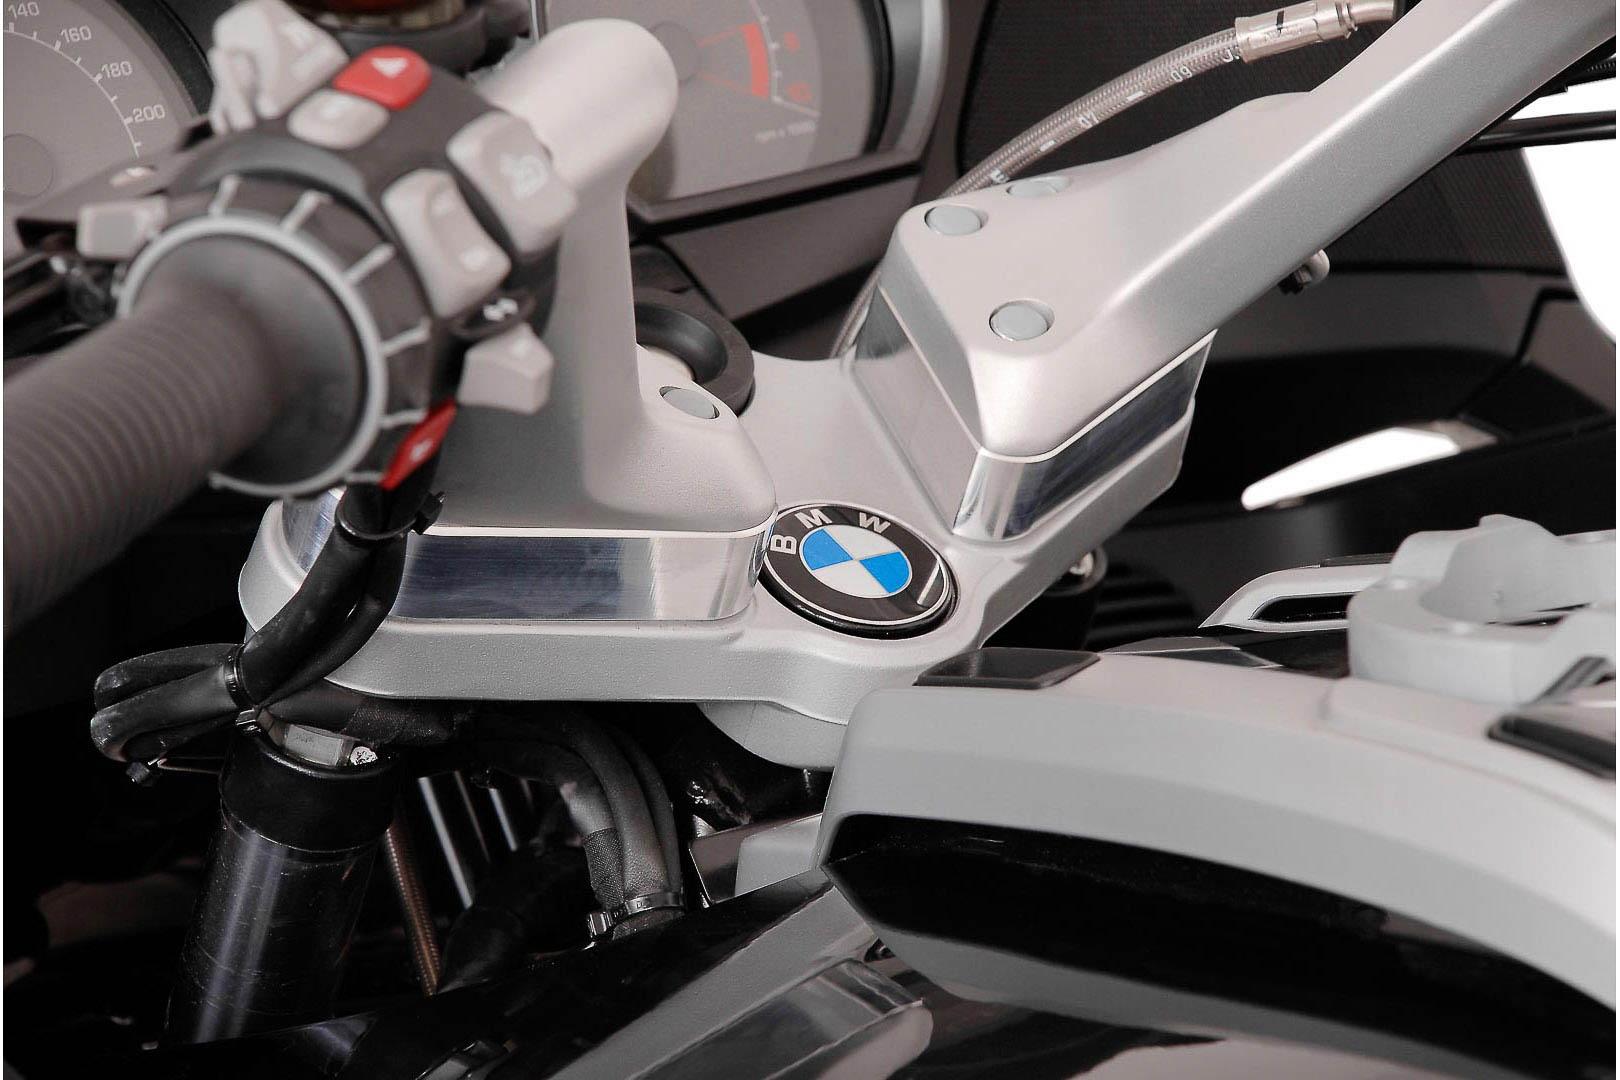 Réhausse de guidon SW-MOTECH H:25 mm gris BMW R 1200 RT 05-